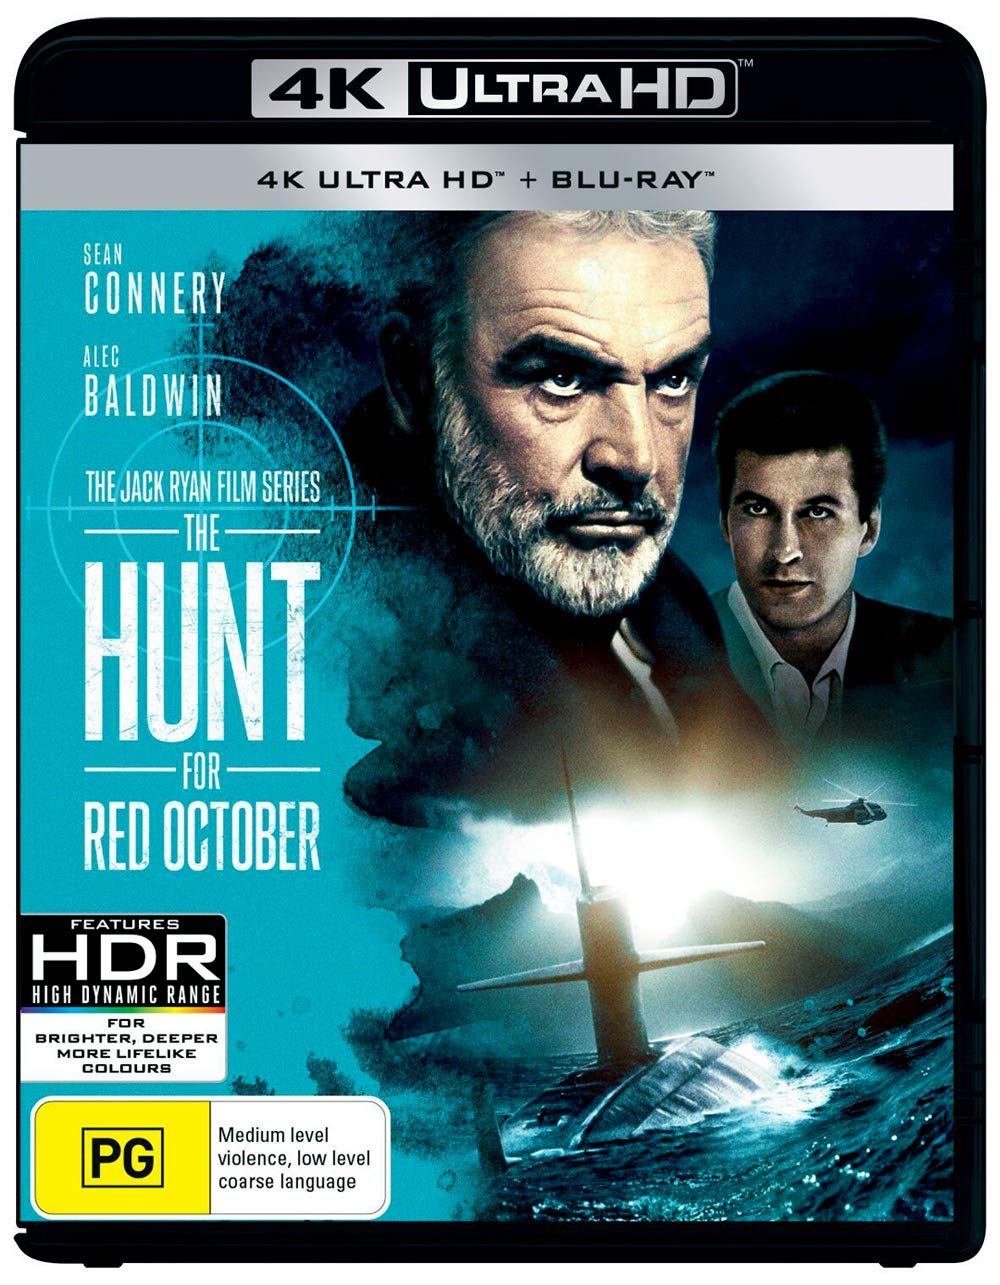 Amazon Com The Hunt For Red October 4k Uhd Blu Ray Sean Connery Non Usa Format Region B Import Australia Sean Connery Alec Baldwin Scott Glenn James Earl Jones John